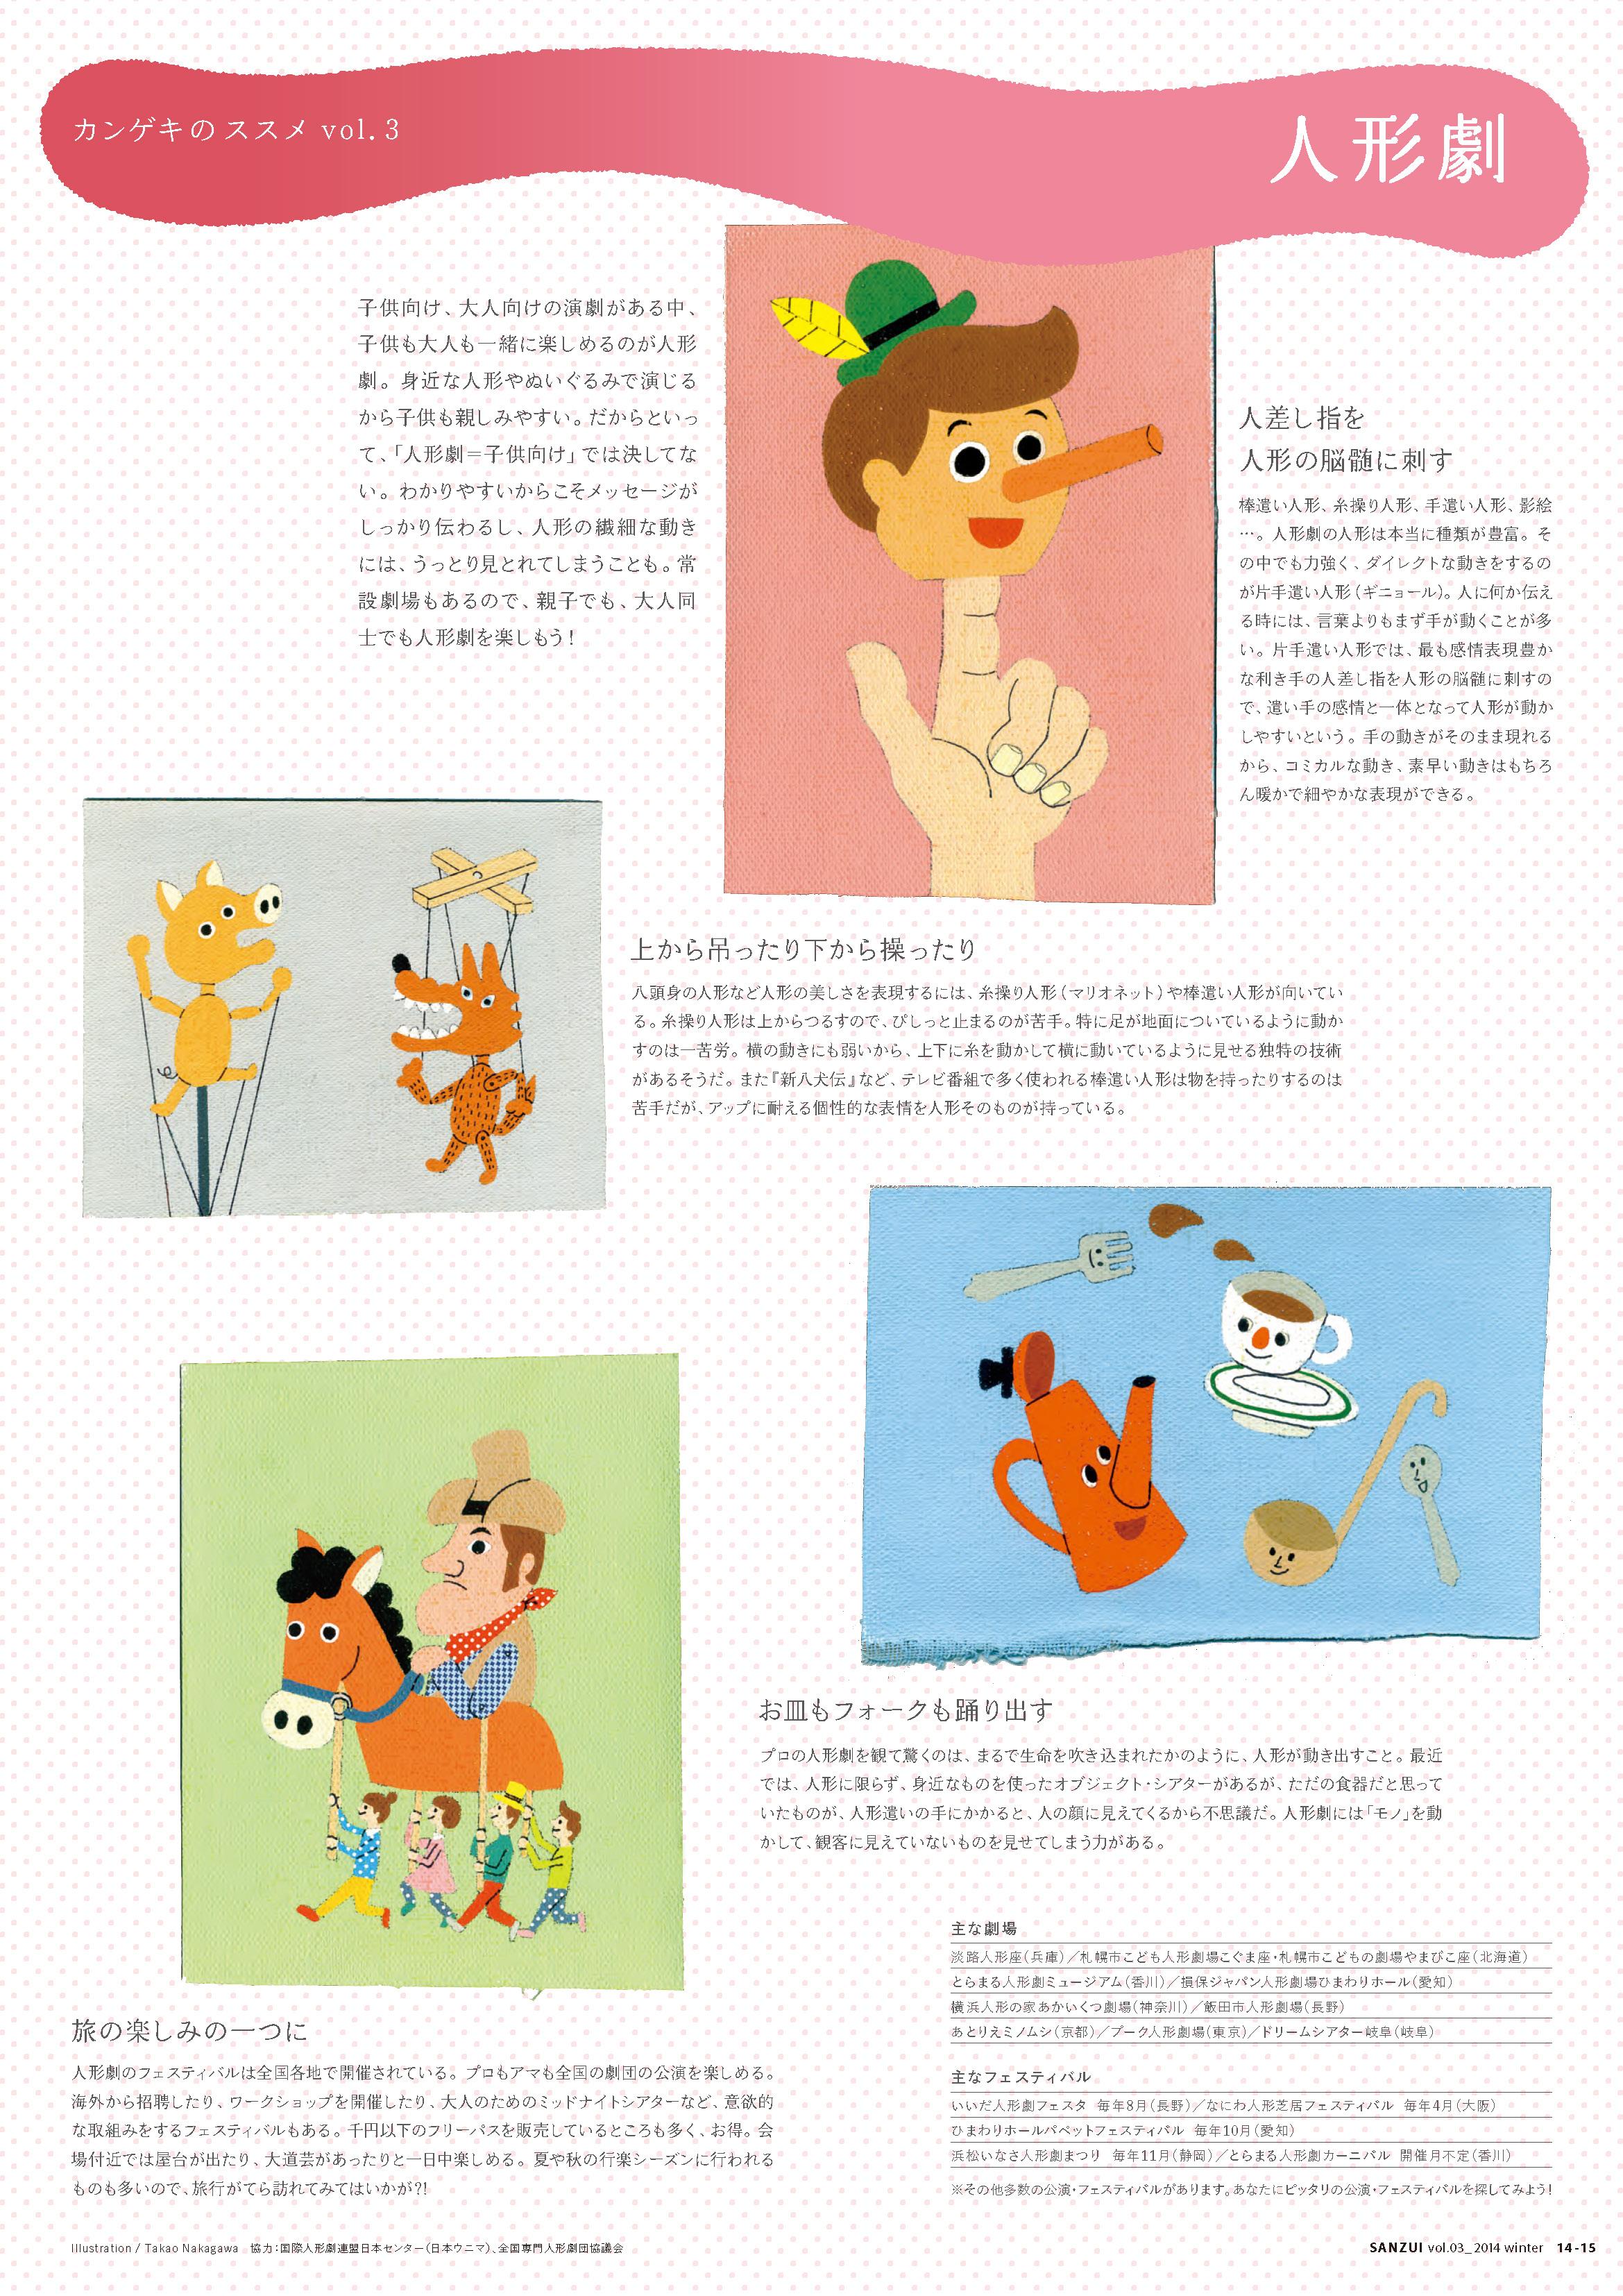 sanzui03_08.jpg